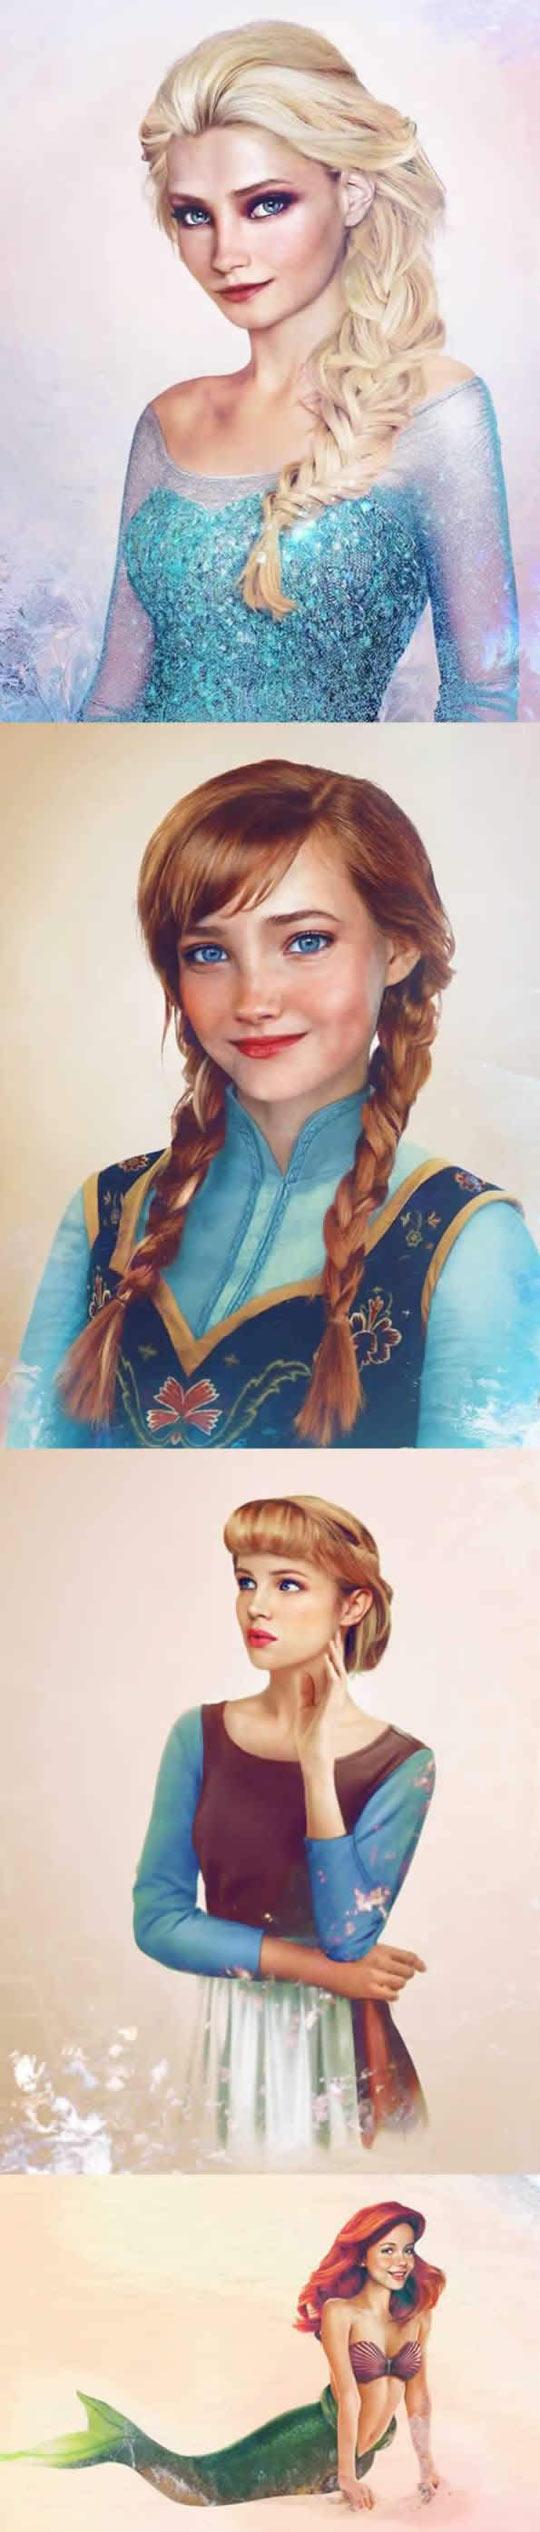 Realistic Disney Princesses